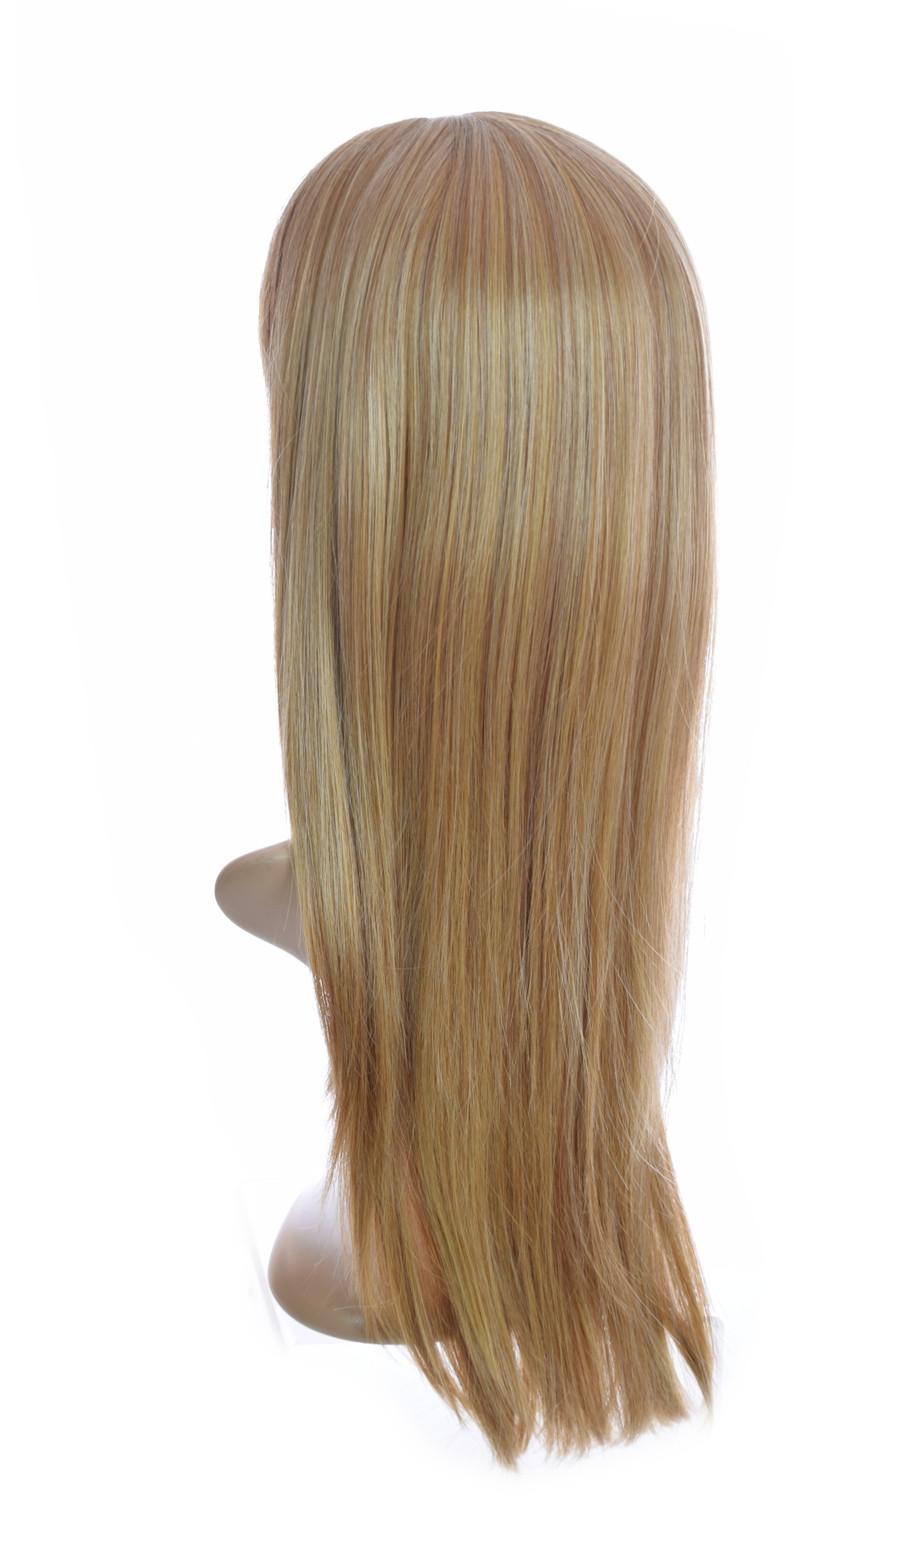 Fawcett Blonde Mix Collette Wig. Long Bangs Wig